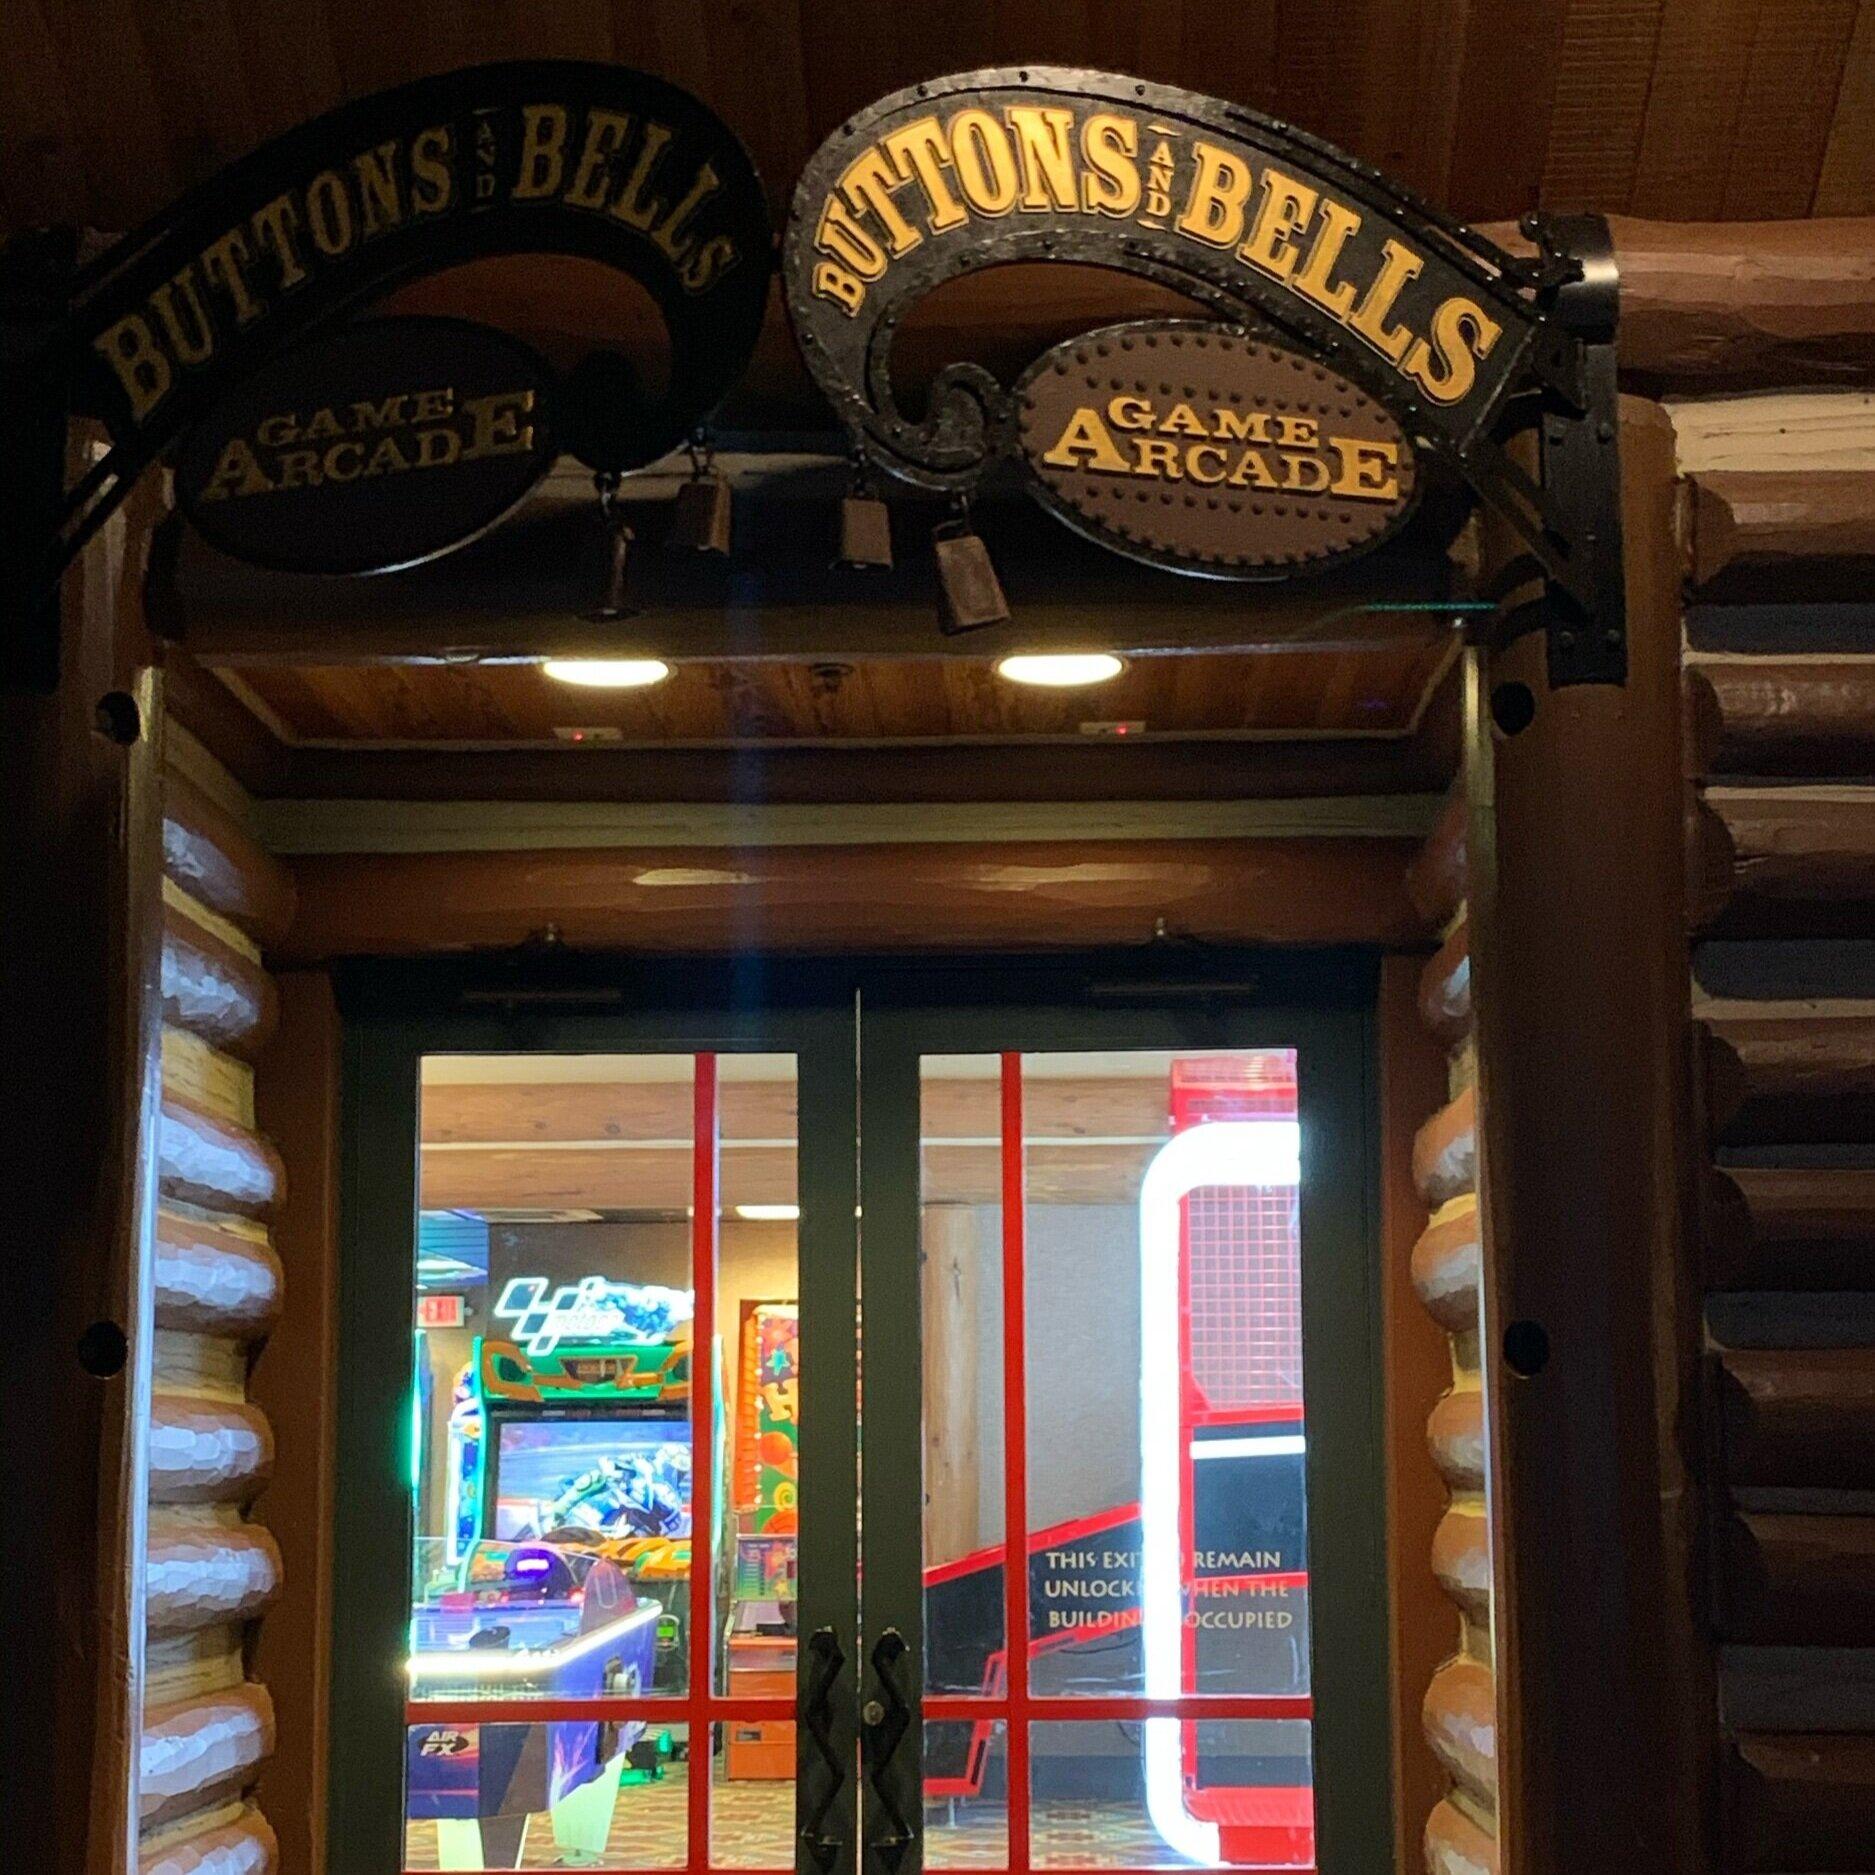 Buttons & Bells Arcade at Disney's Wilderness Lodge